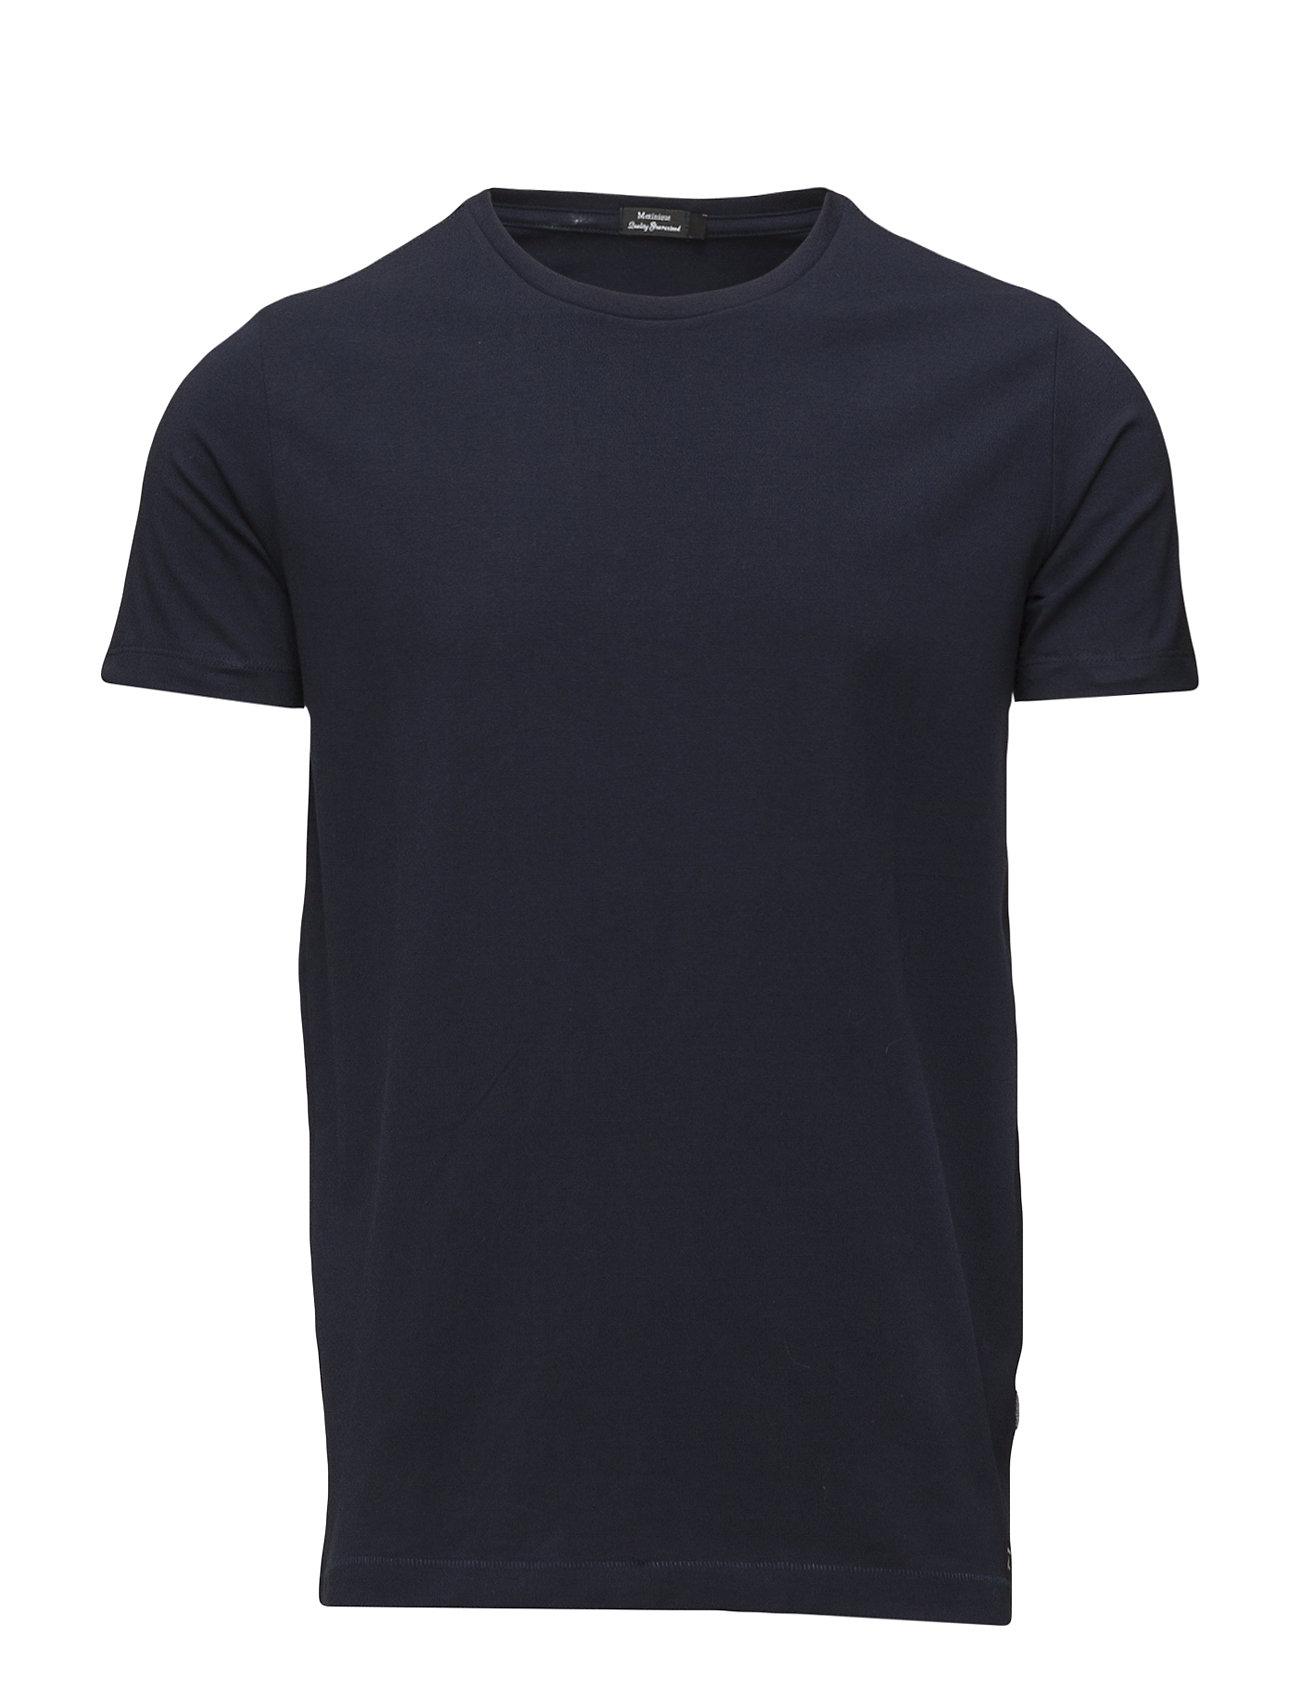 Matinique Jermalink Cotton Stretch - MIDNIGHT BLUE